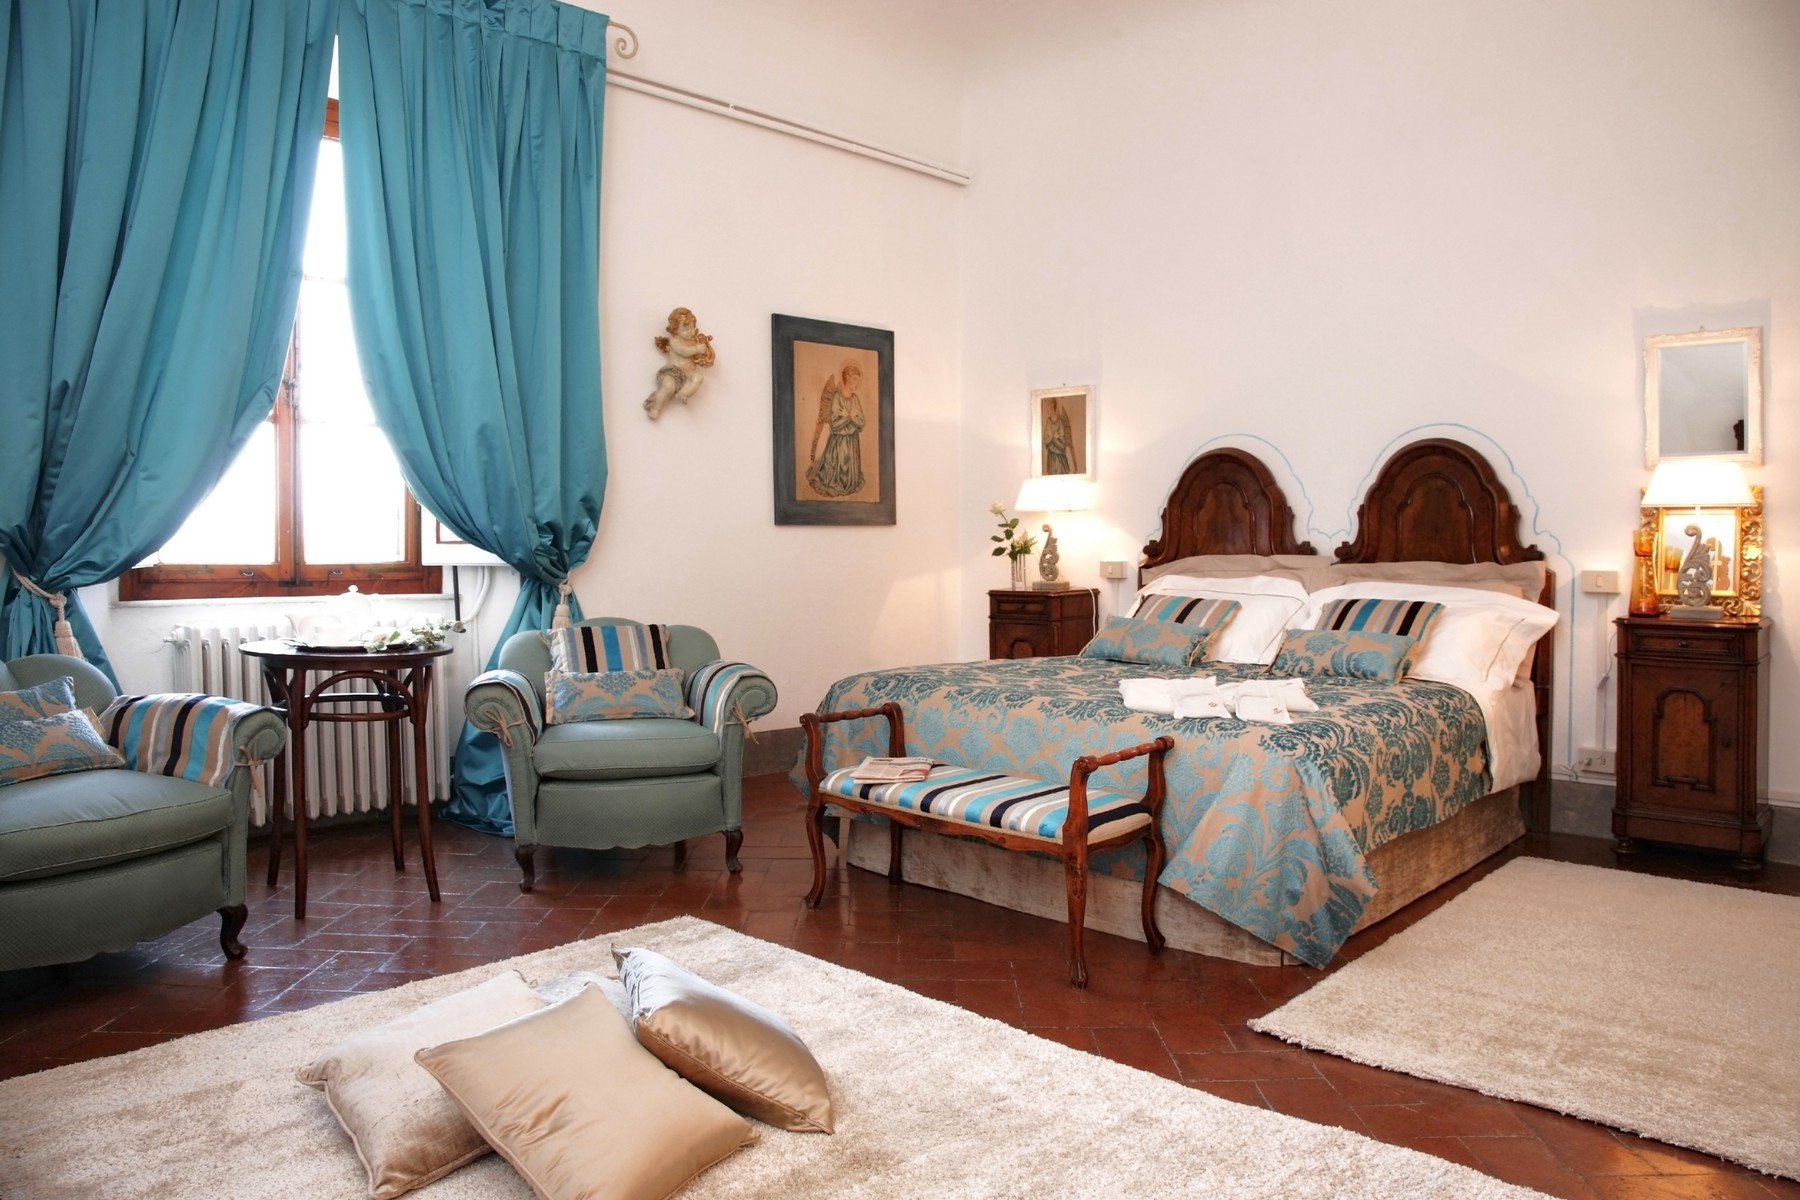 Villa in Vendita a Gaiole In Chianti: 5 locali, 4285 mq - Foto 7